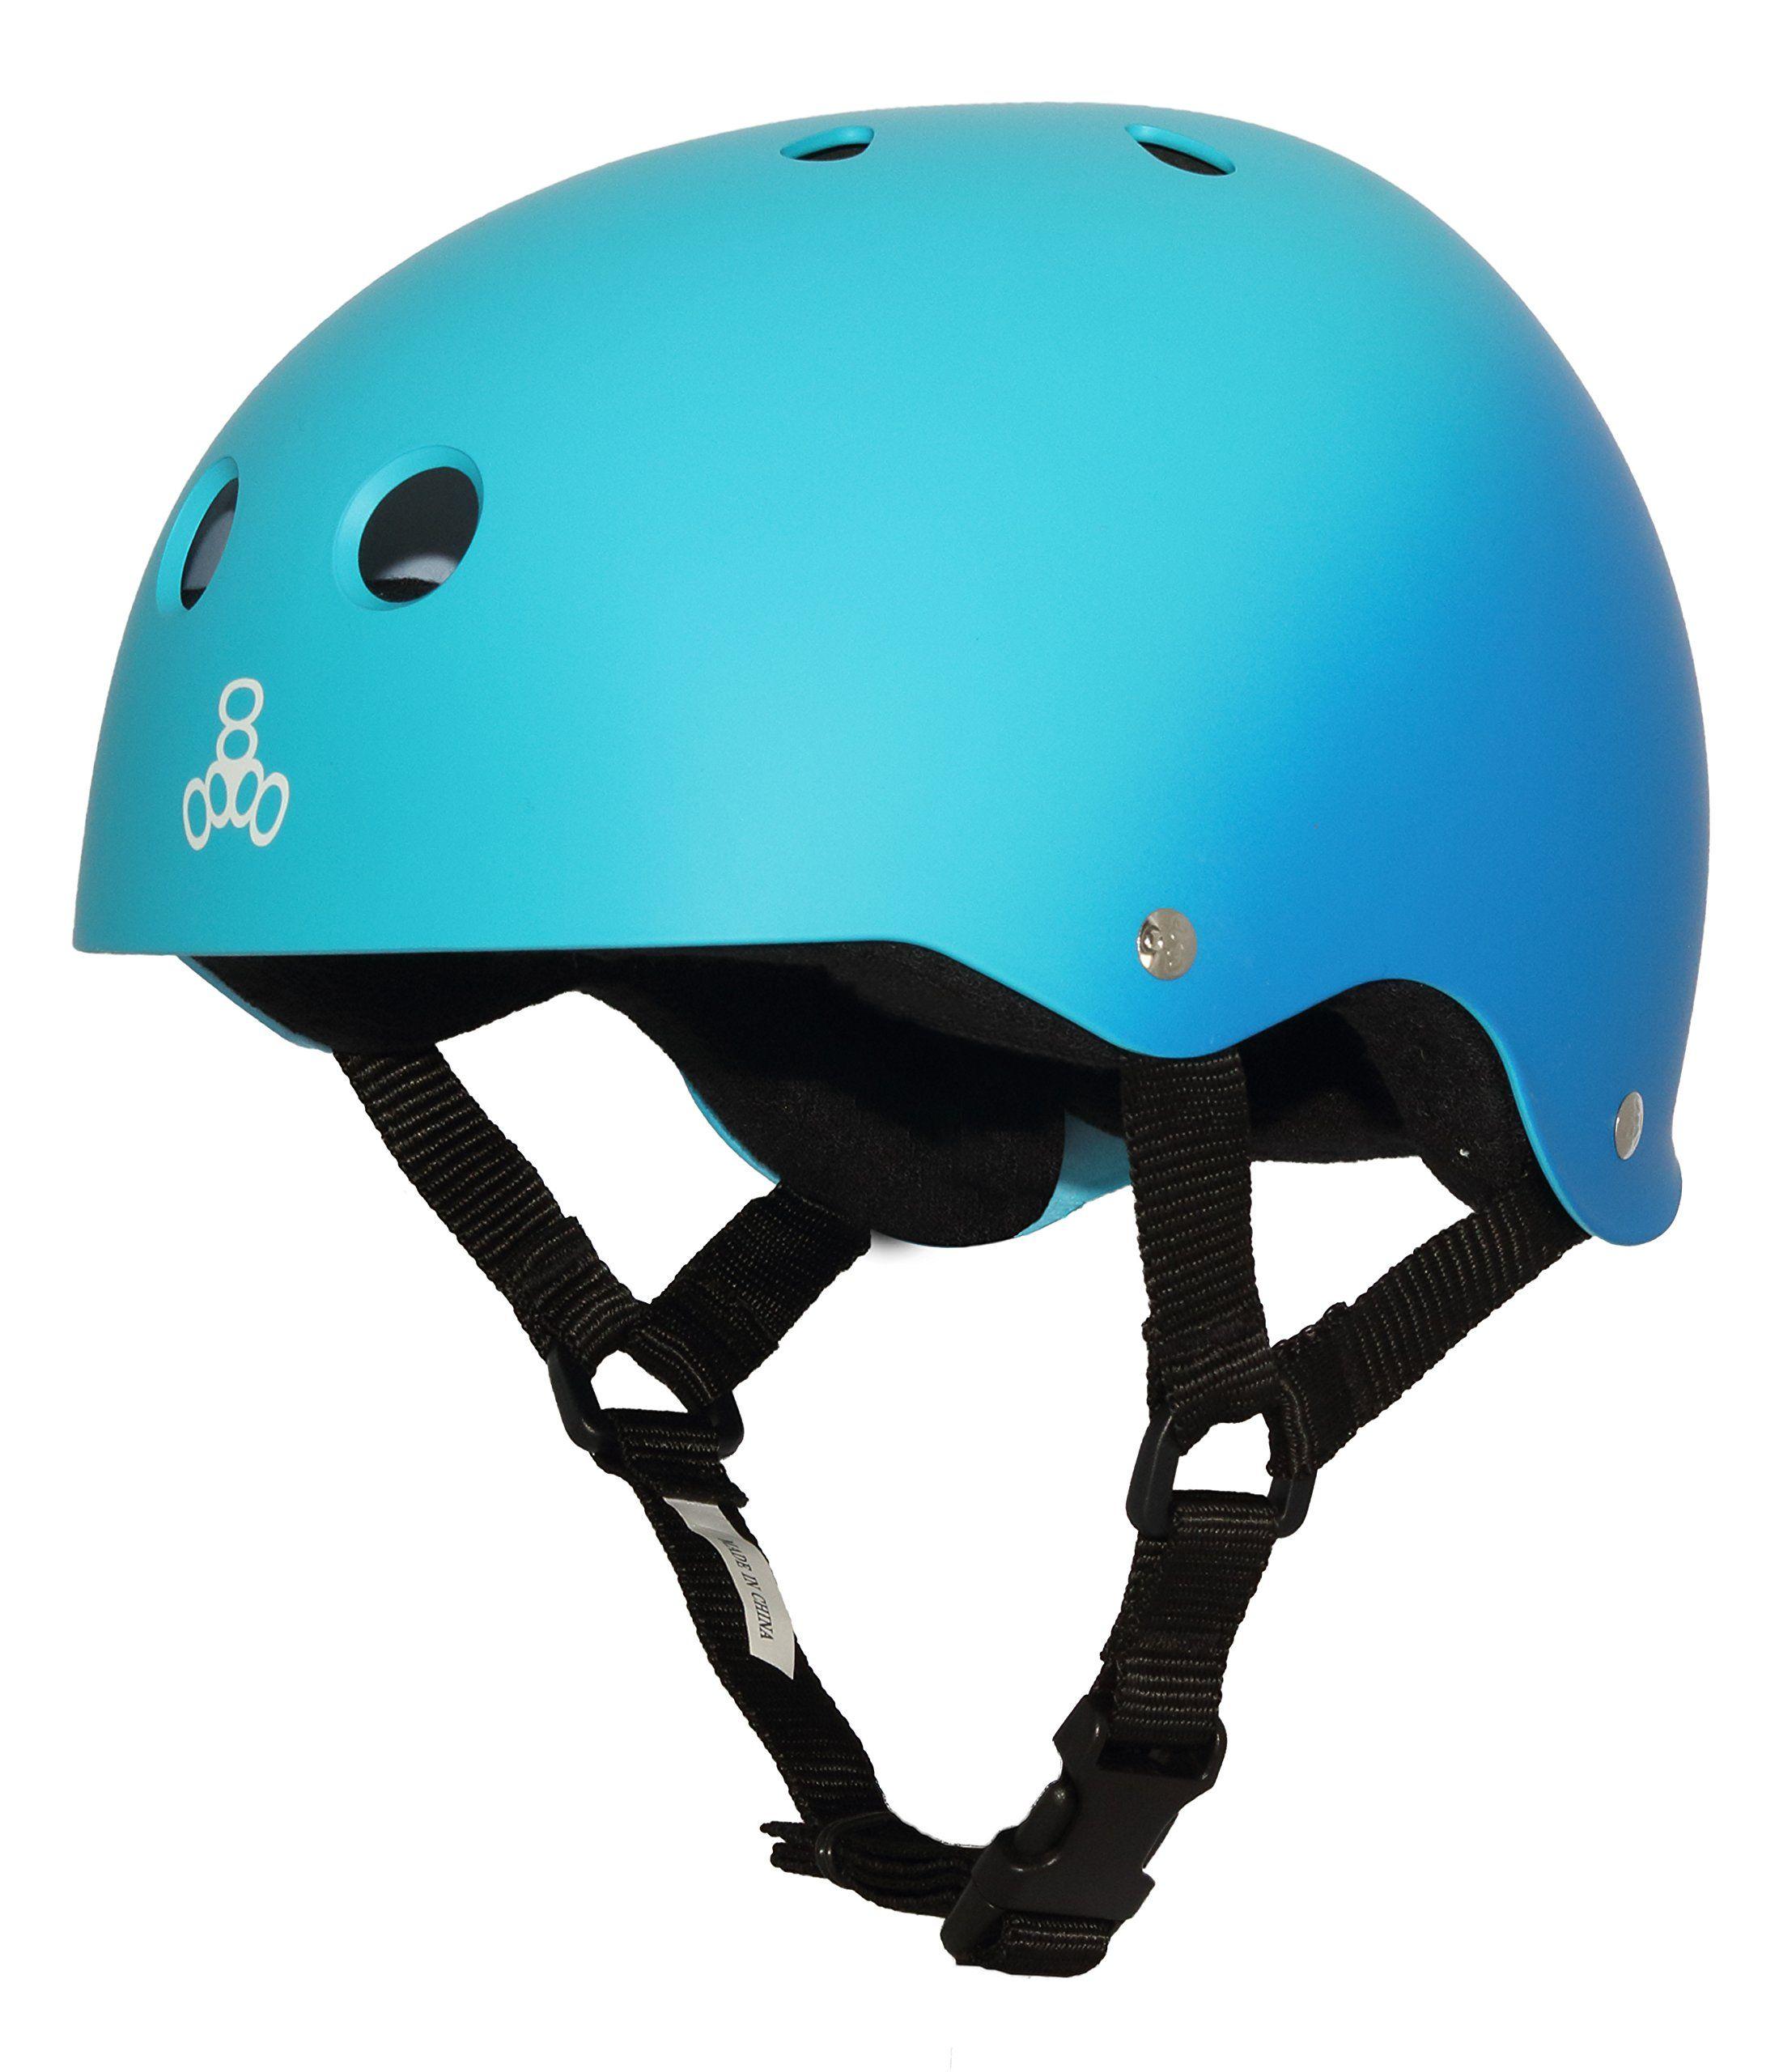 Triple Eight Helmet with Sweatsaver Liner *** Learn more